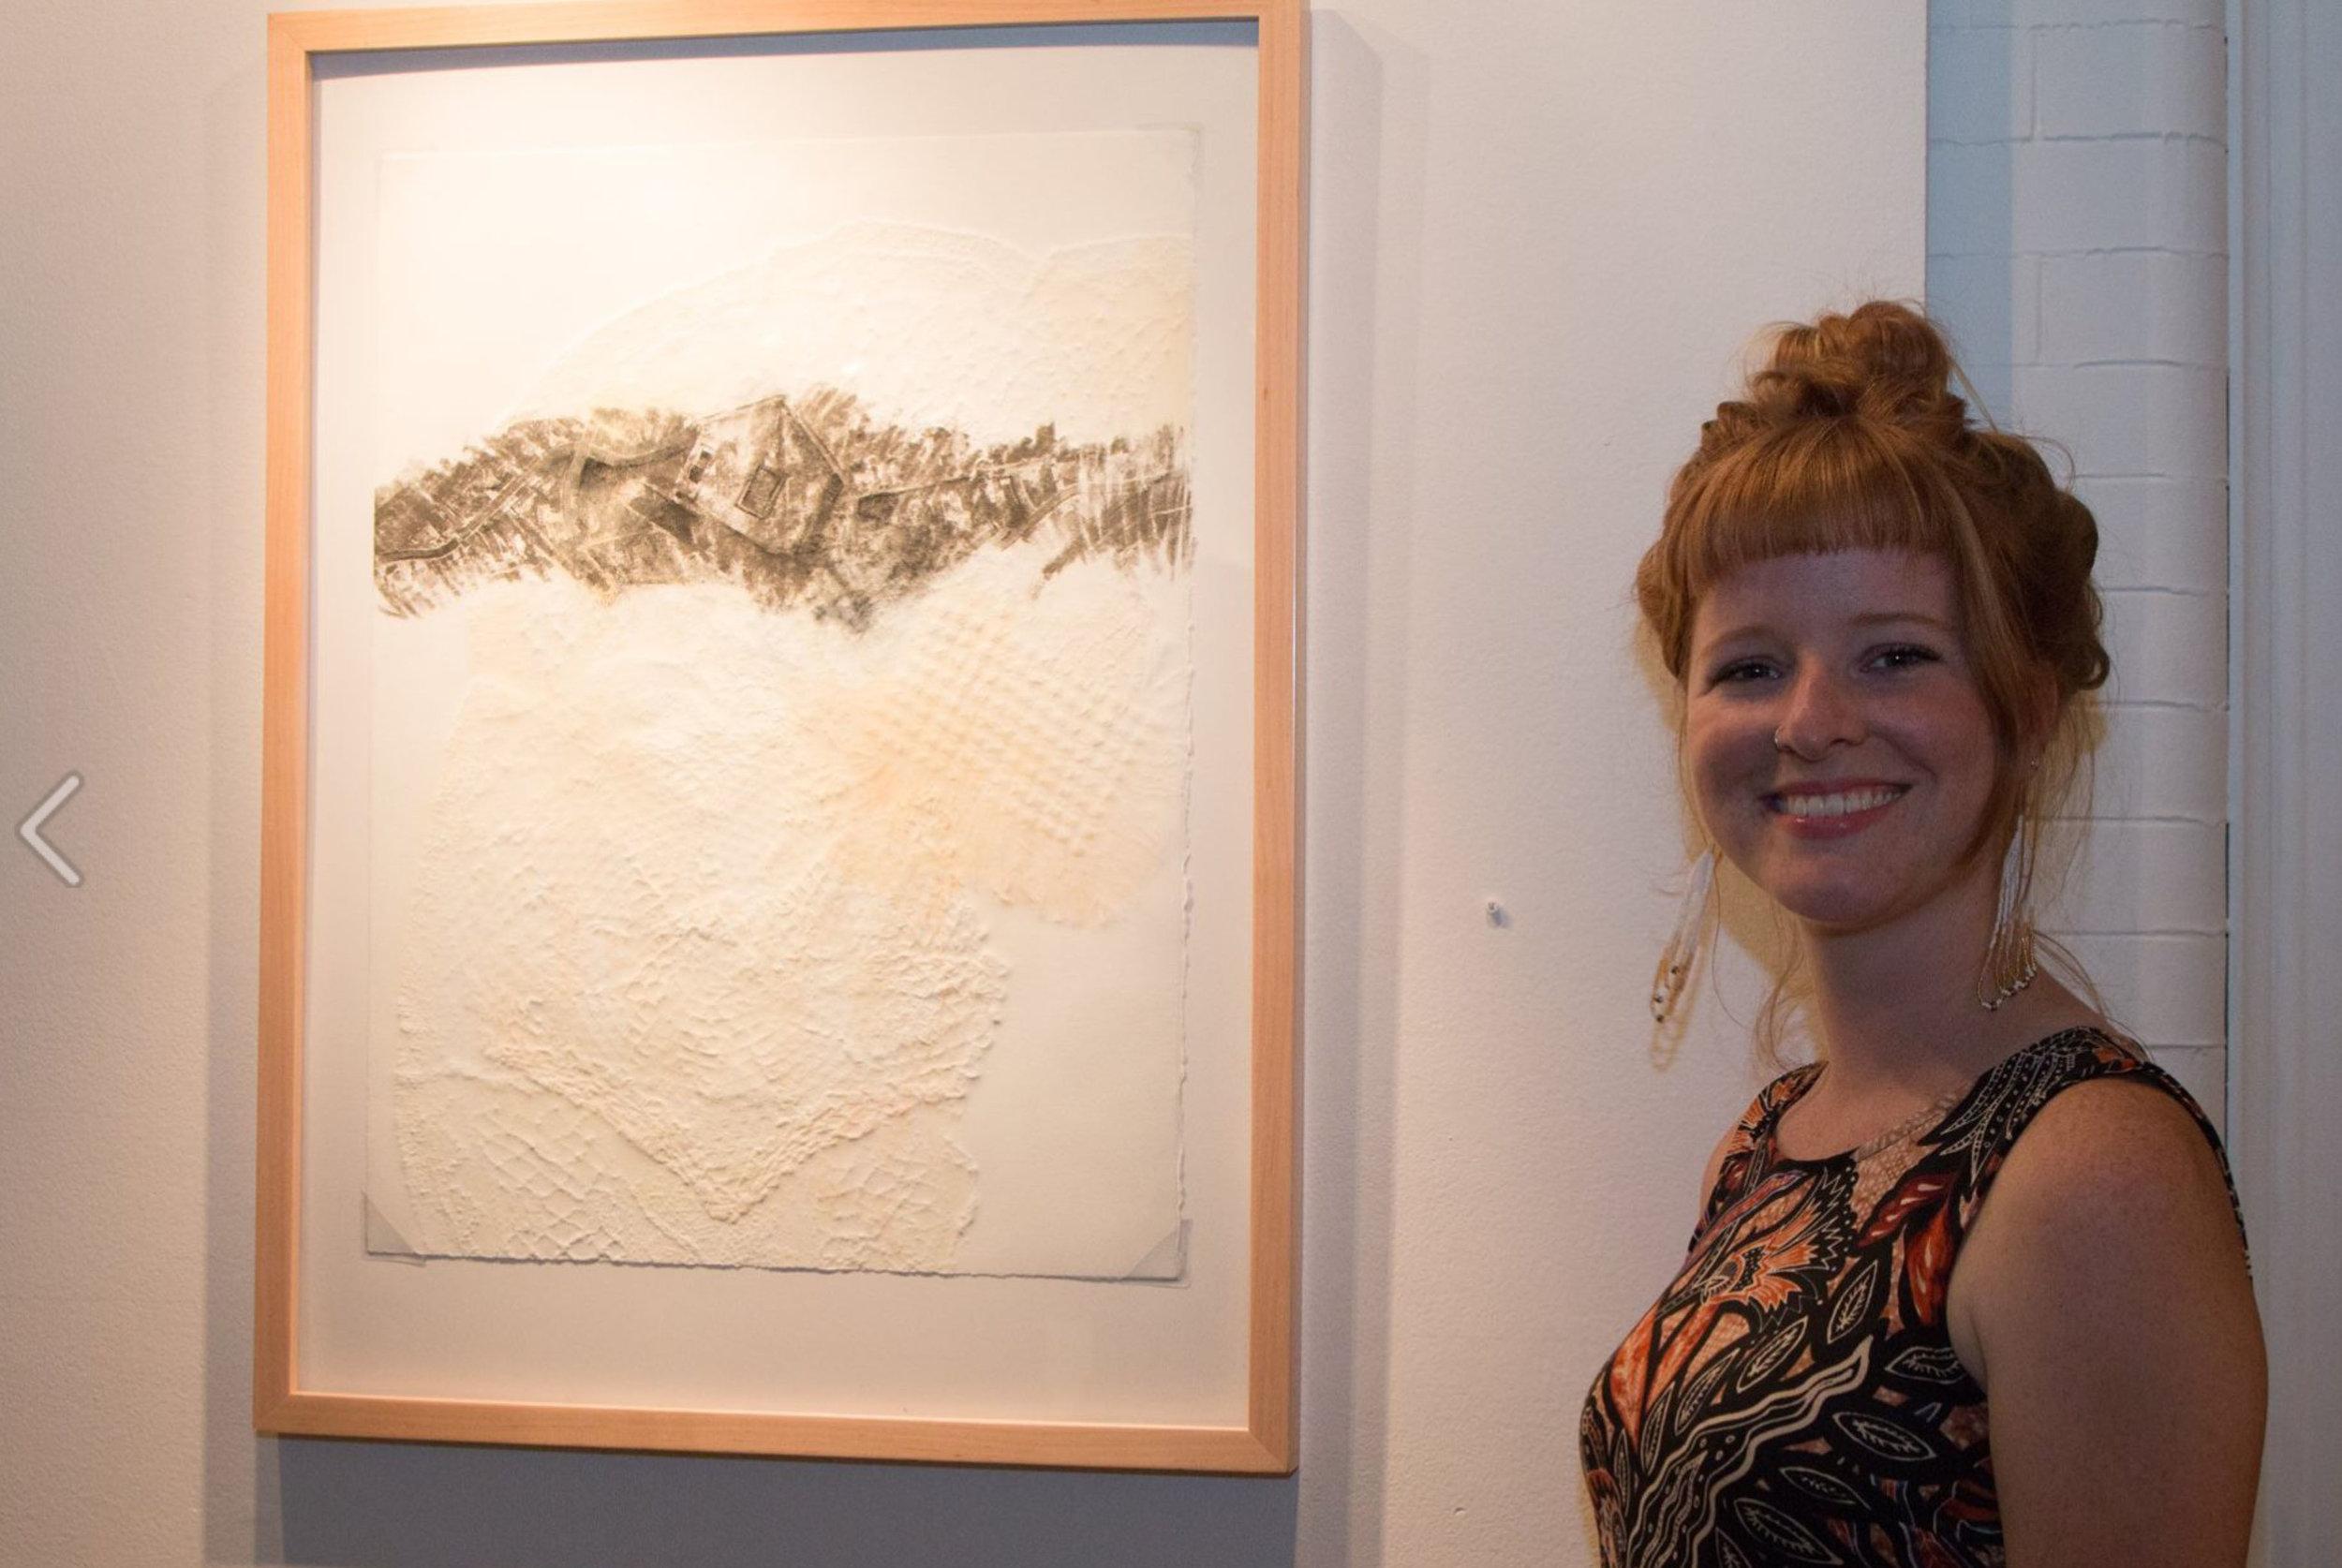 Graduate student Molly Markow poses alongside her work. Photo Courtesy: Justine Kaszynski Photography